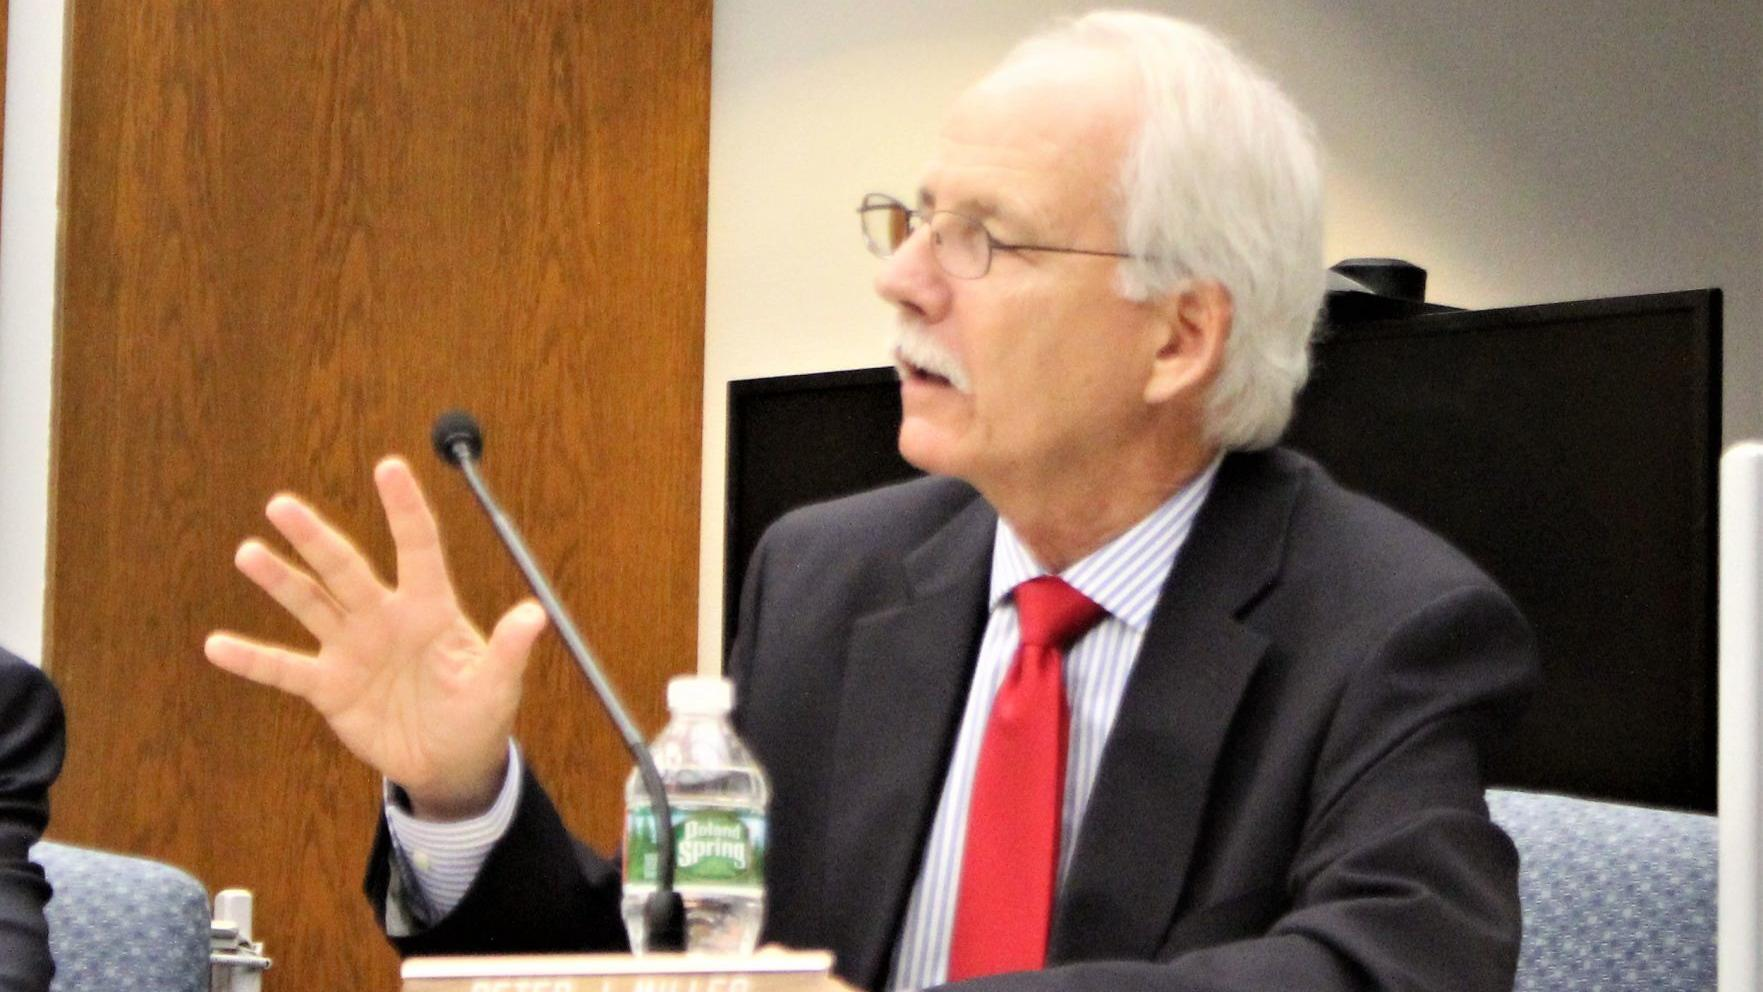 Peter Miller named interim administrator for Hamilton Township